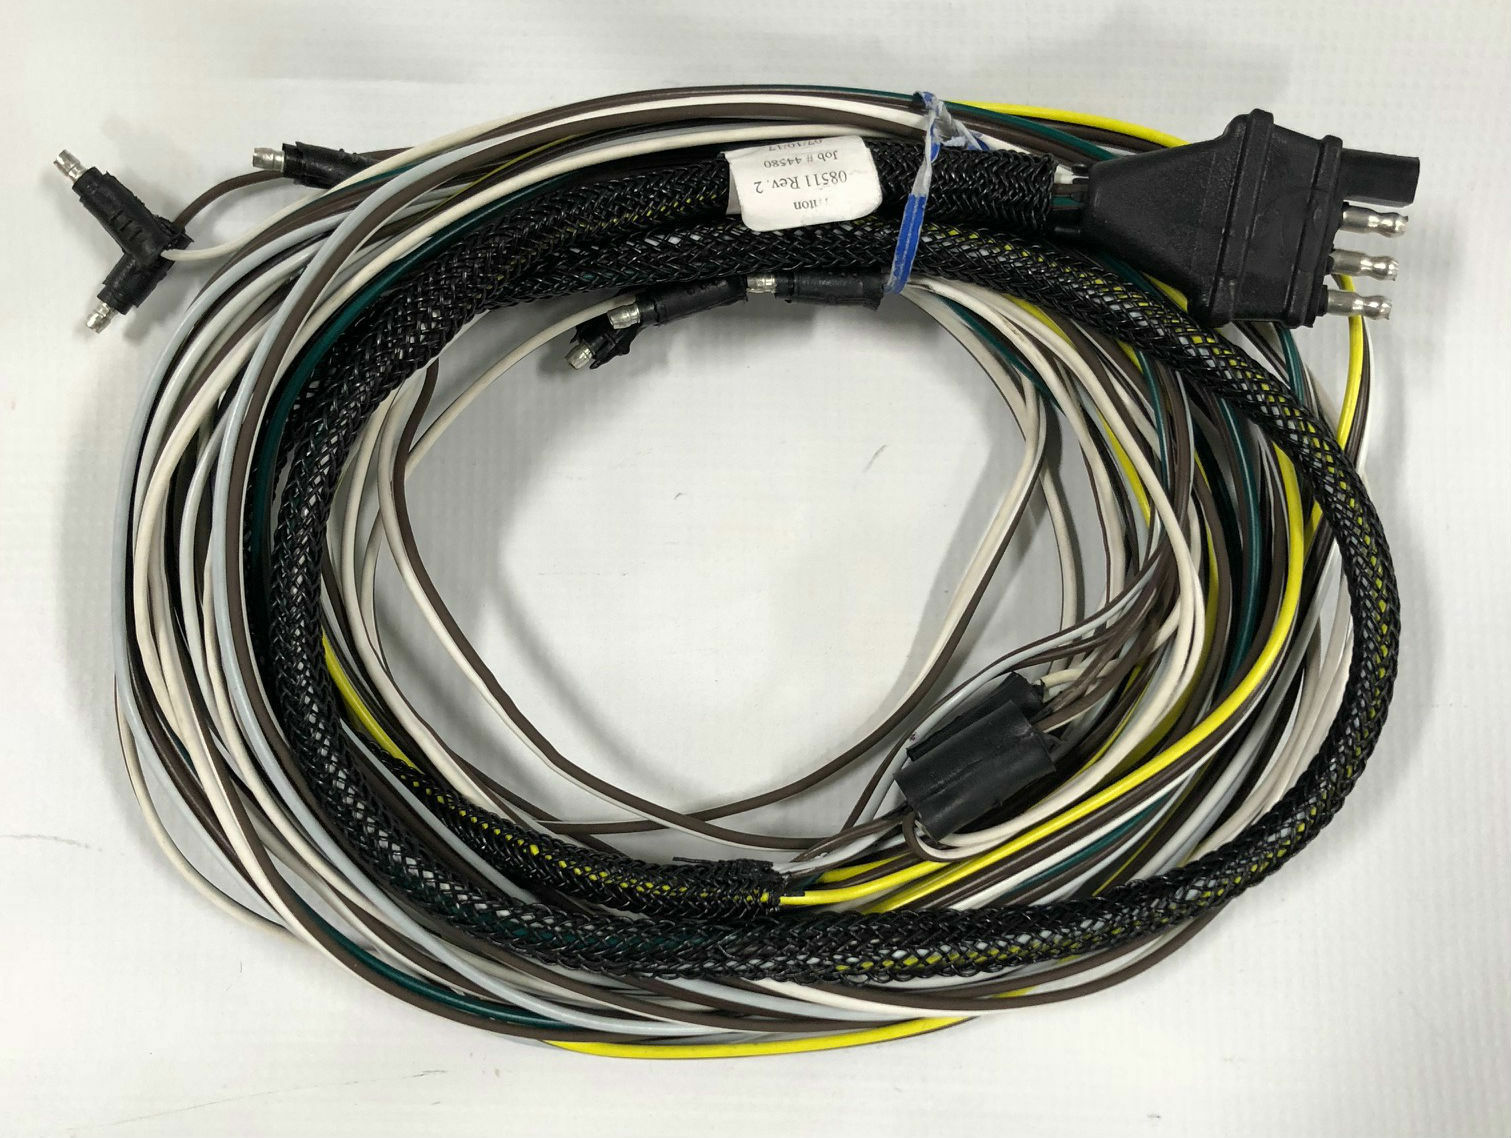 triton 08511 atv88 atv trailer wire harness ebay rh ebay com 4 Wire Trailer Wiring Diagram Six Pin Trailer Wiring Diagram